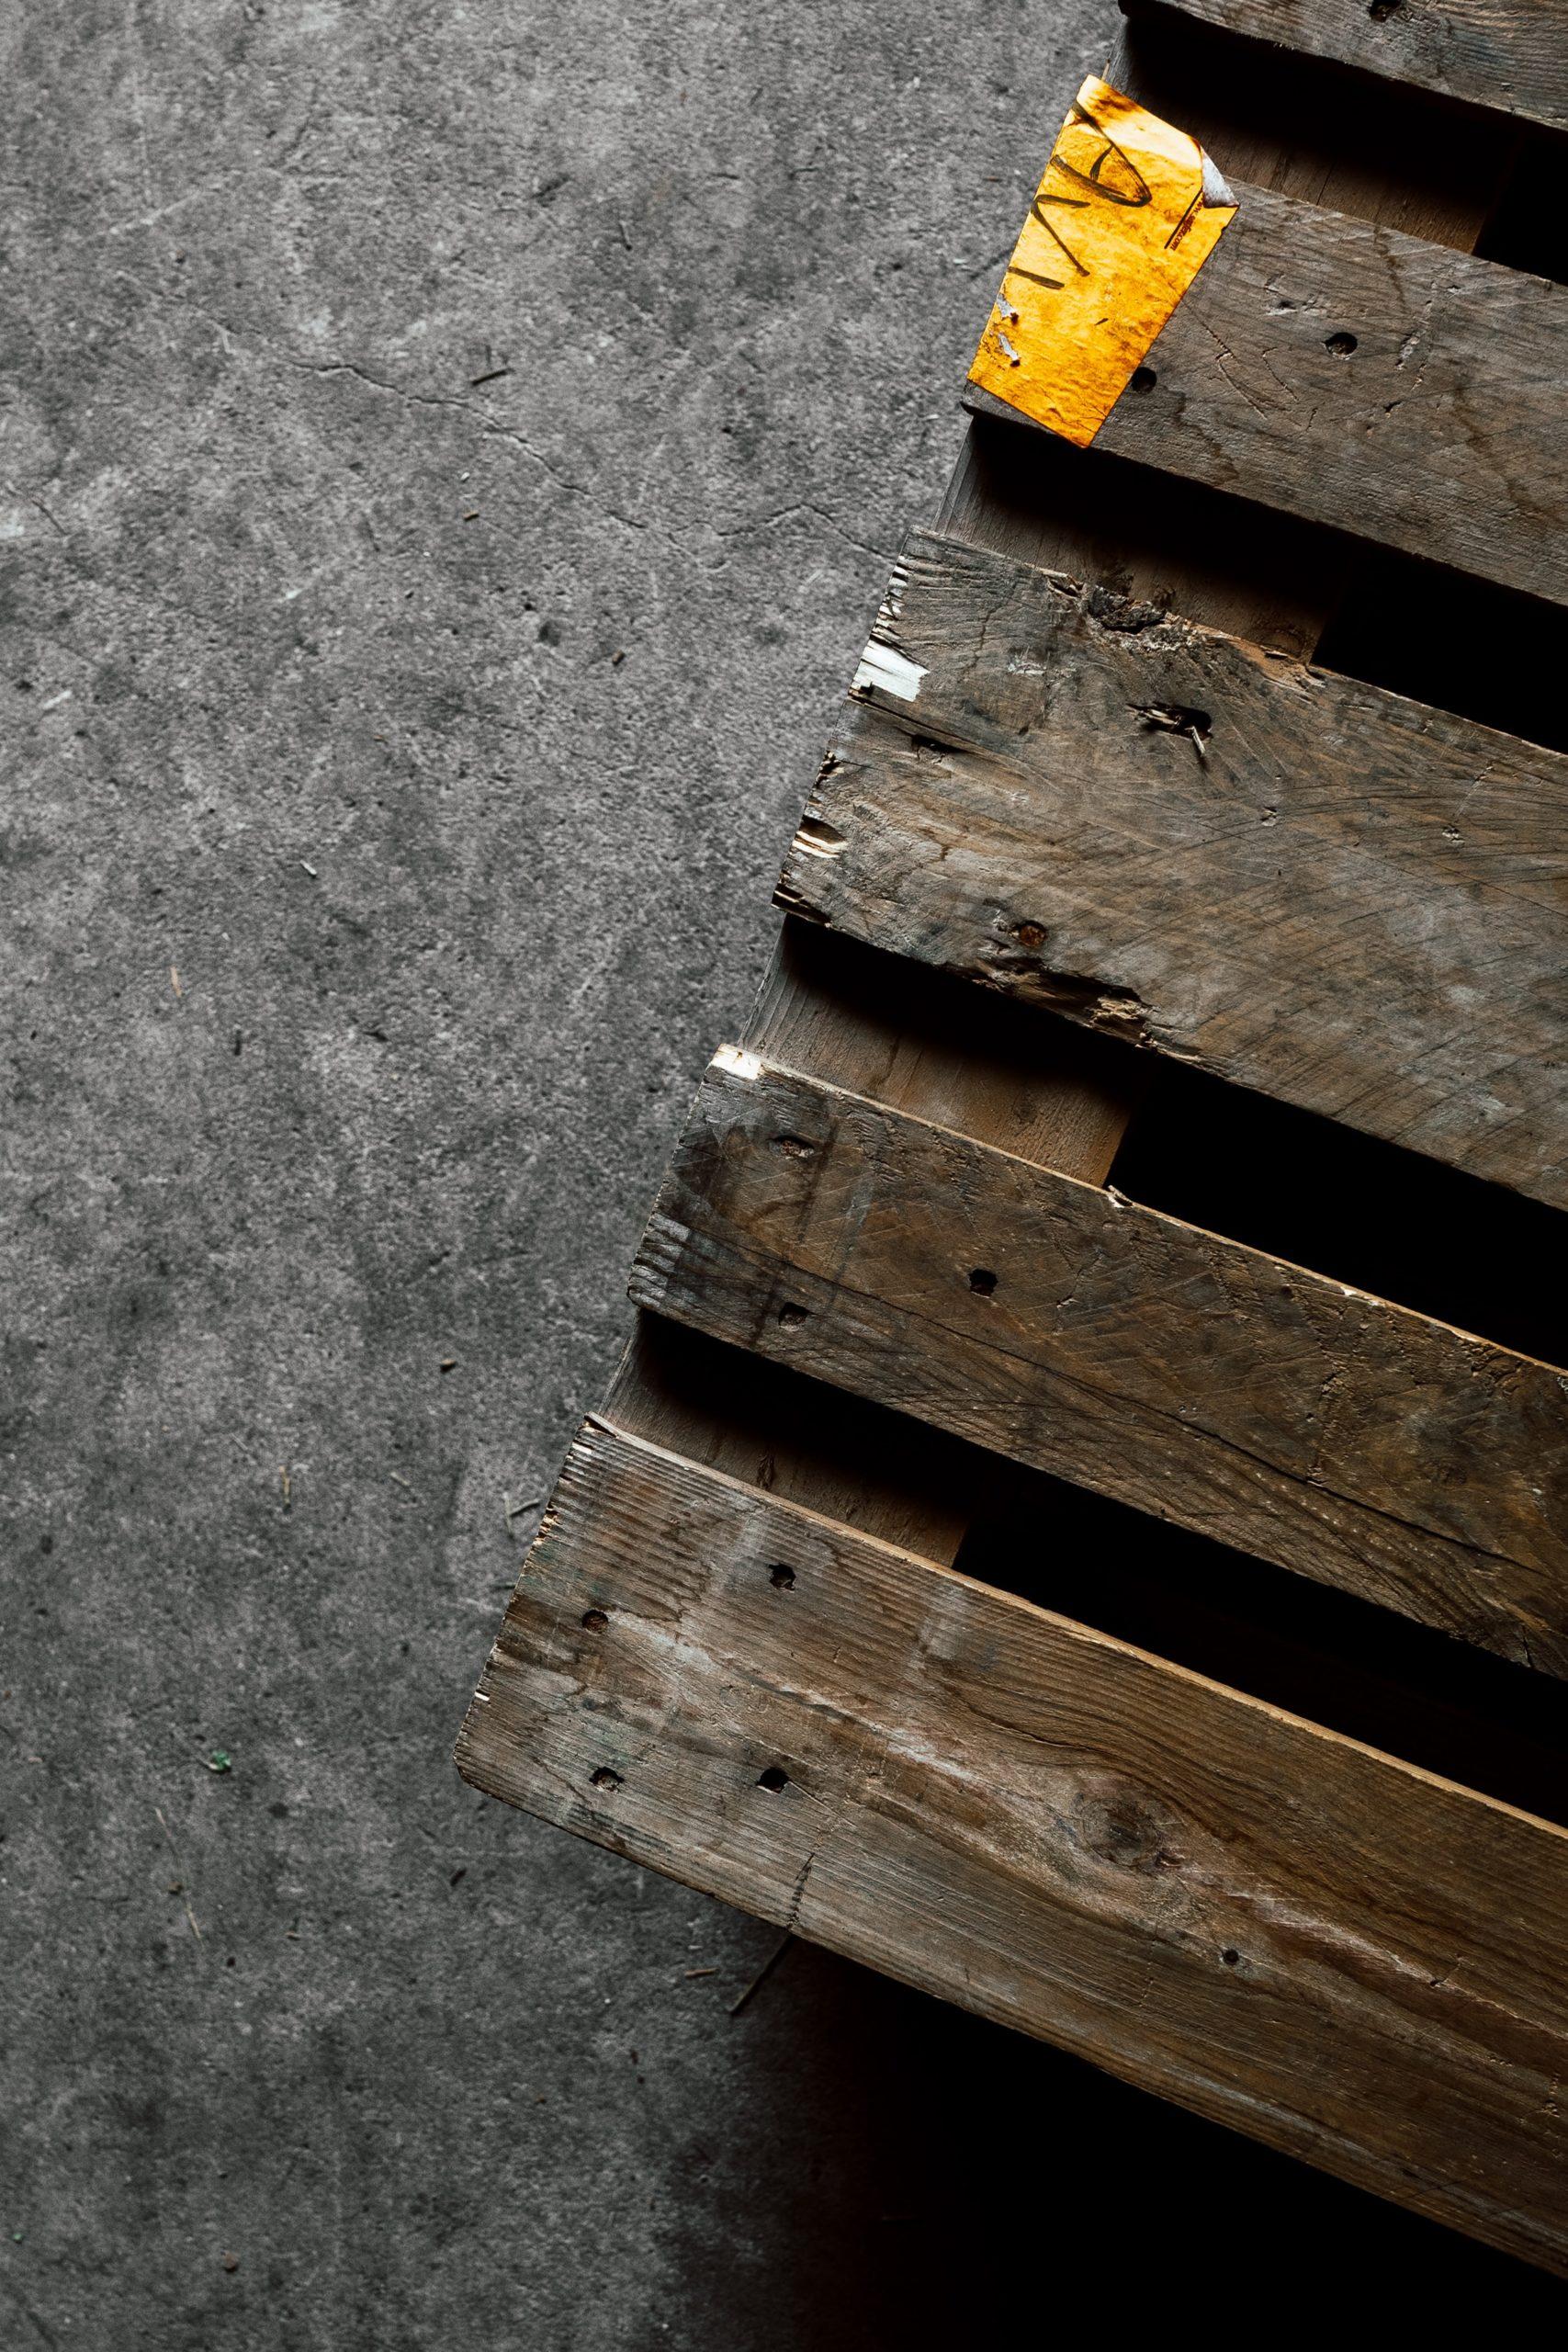 old wooden pallet on cement floor